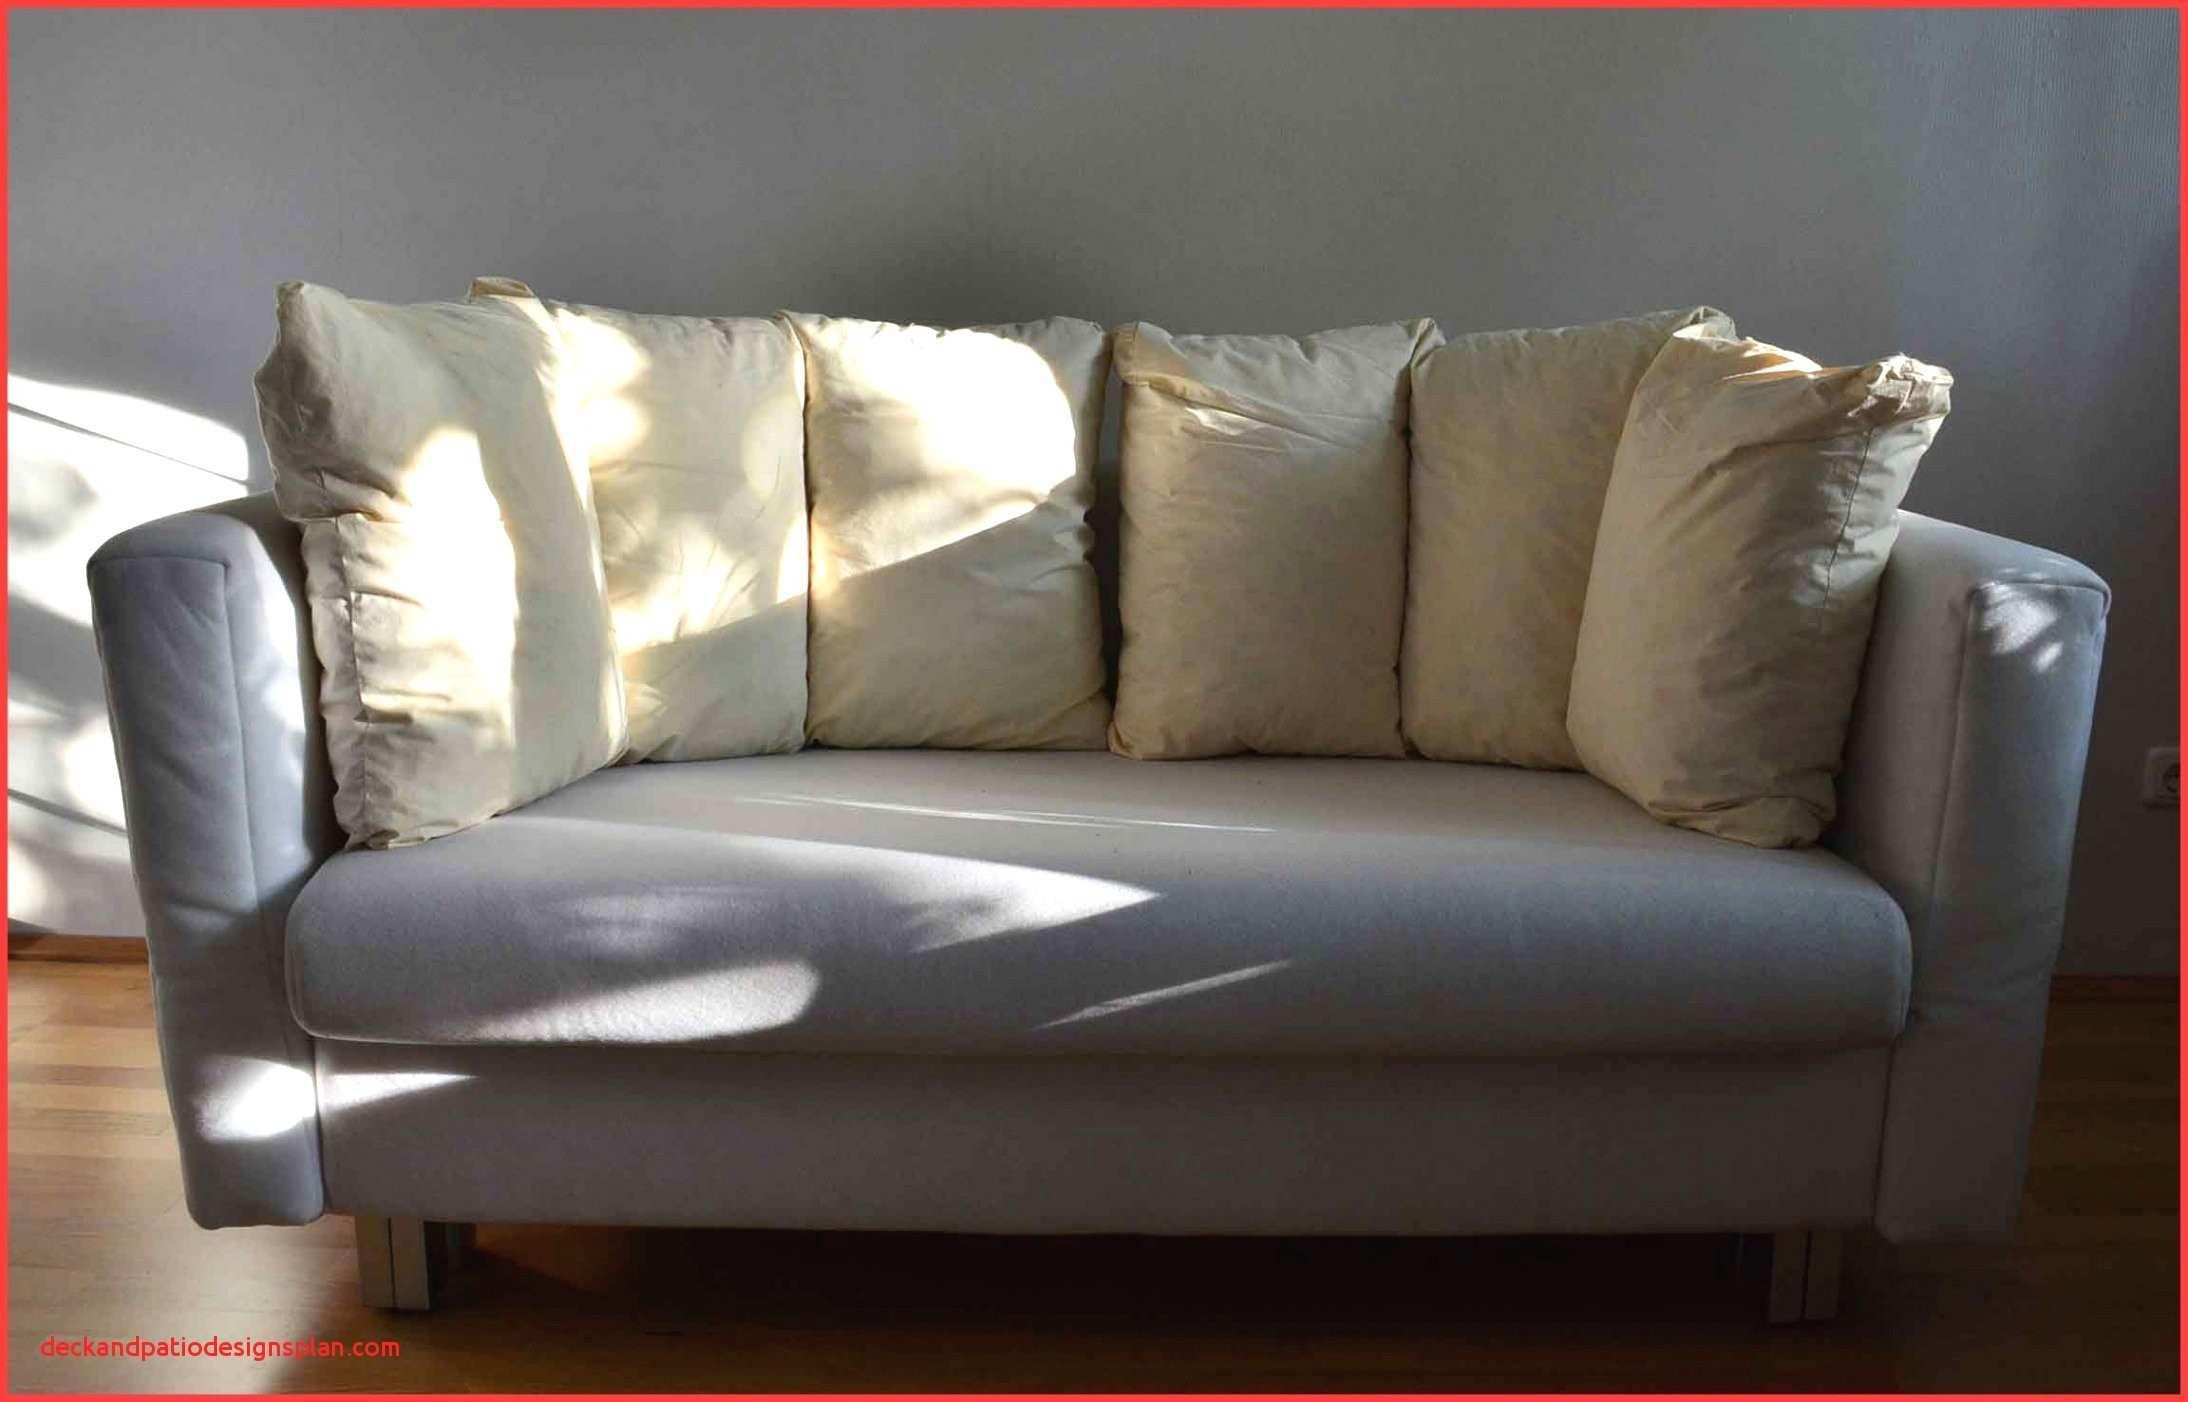 Full Size of Sofa Beziehen Stuhl Neu Sessel Couch Best 29 Xora Boxspring Mit Schlaffunktion Landhaus Big Sam Große Kissen L Form Led Hay Mags Büffelleder Grün De Sede Sofa Sofa Beziehen